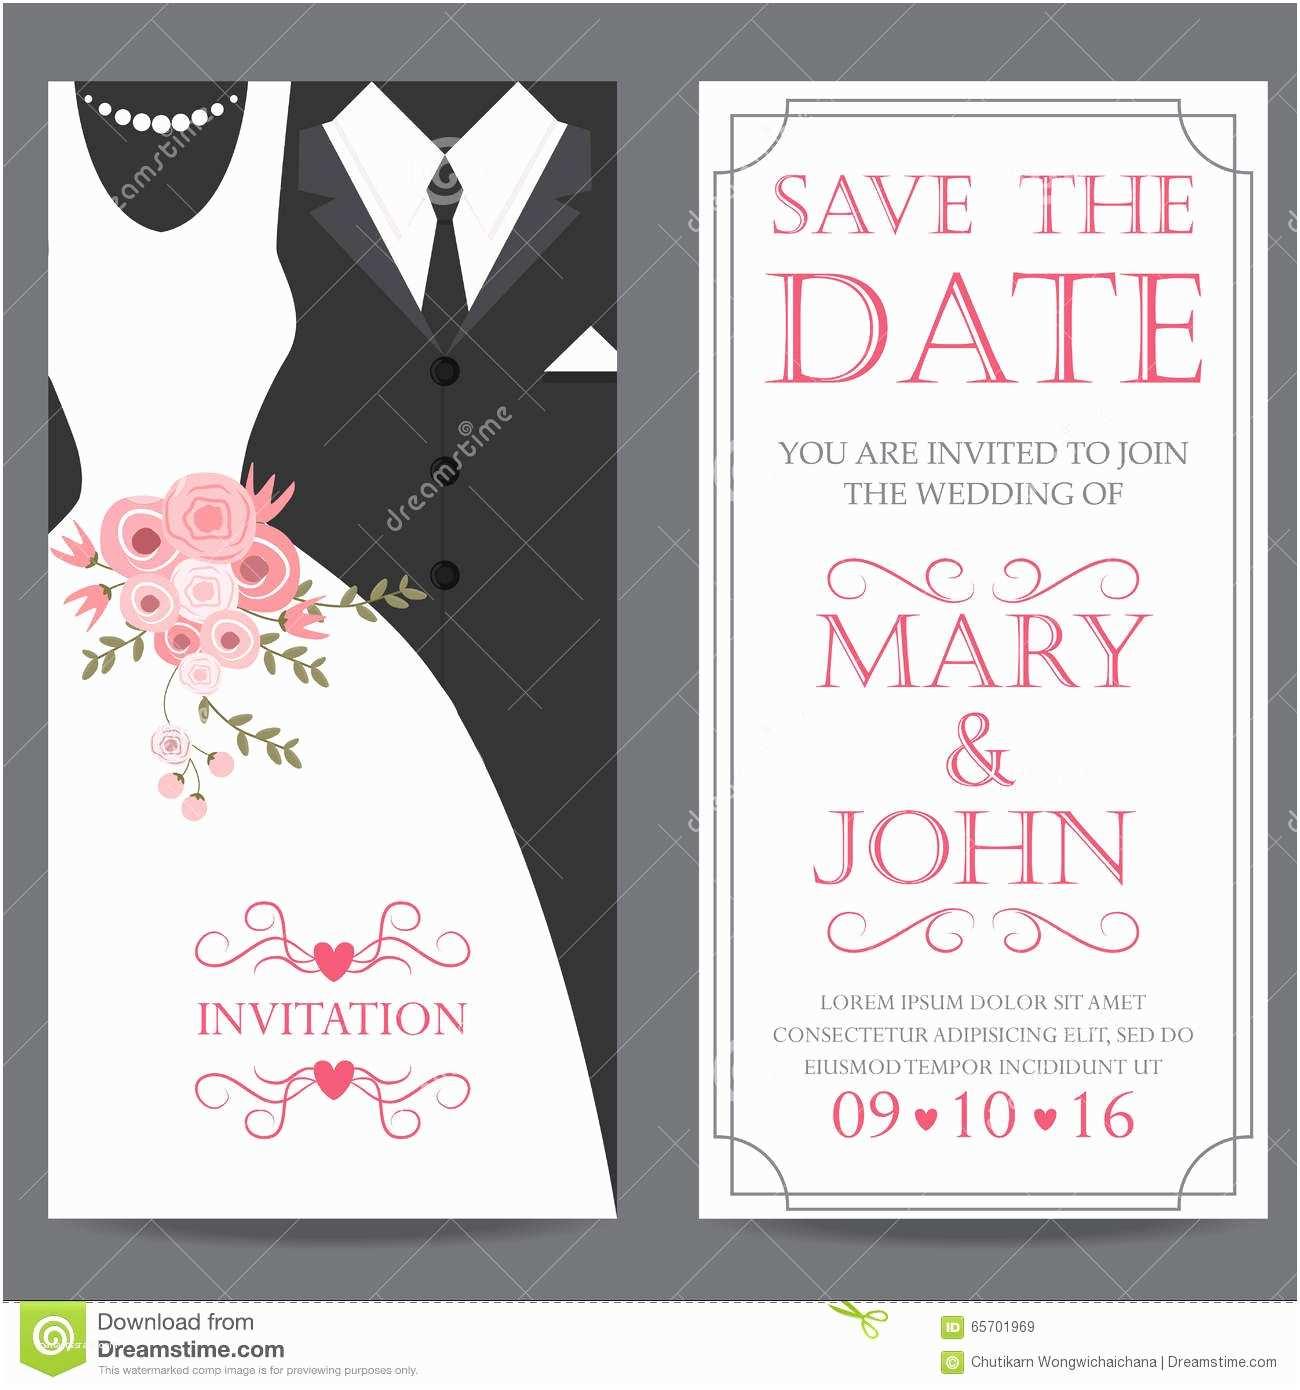 Bride and Groom Wedding Invitations Bride and Groom Wedding Invitation Card Stock Vector